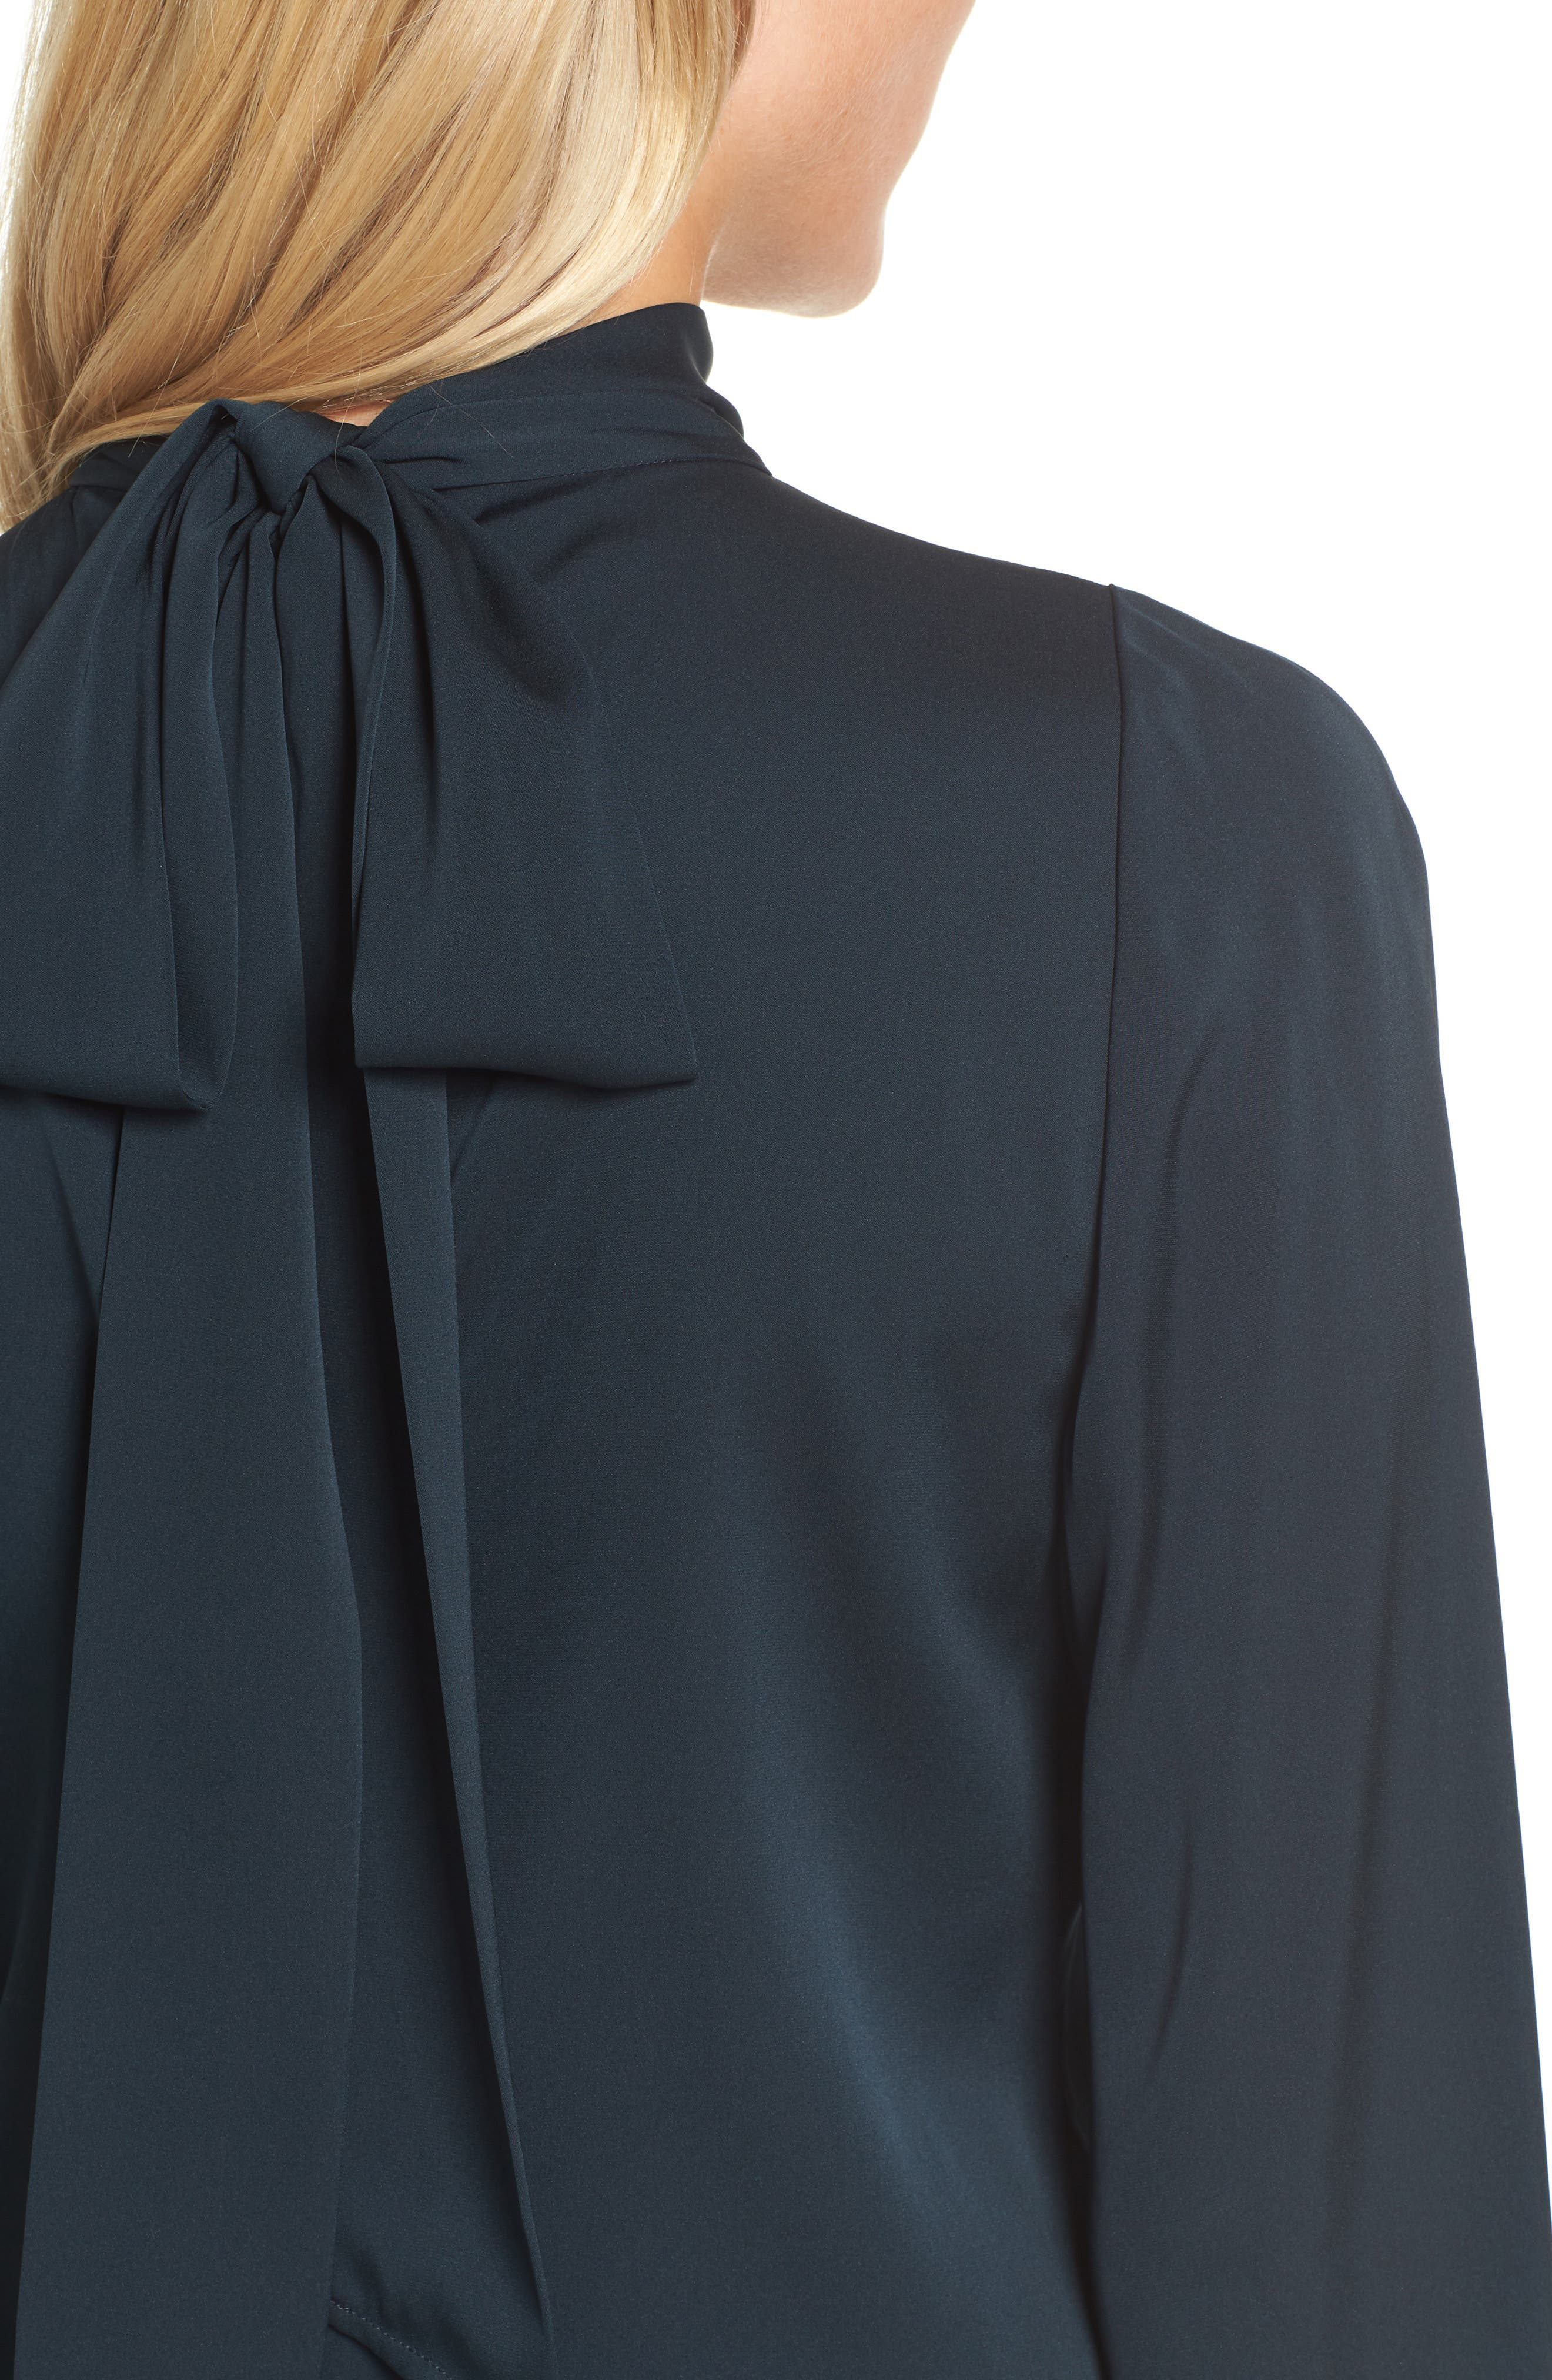 Tie Back Stretch Silk Blouse,                             Alternate thumbnail 4, color,                             301